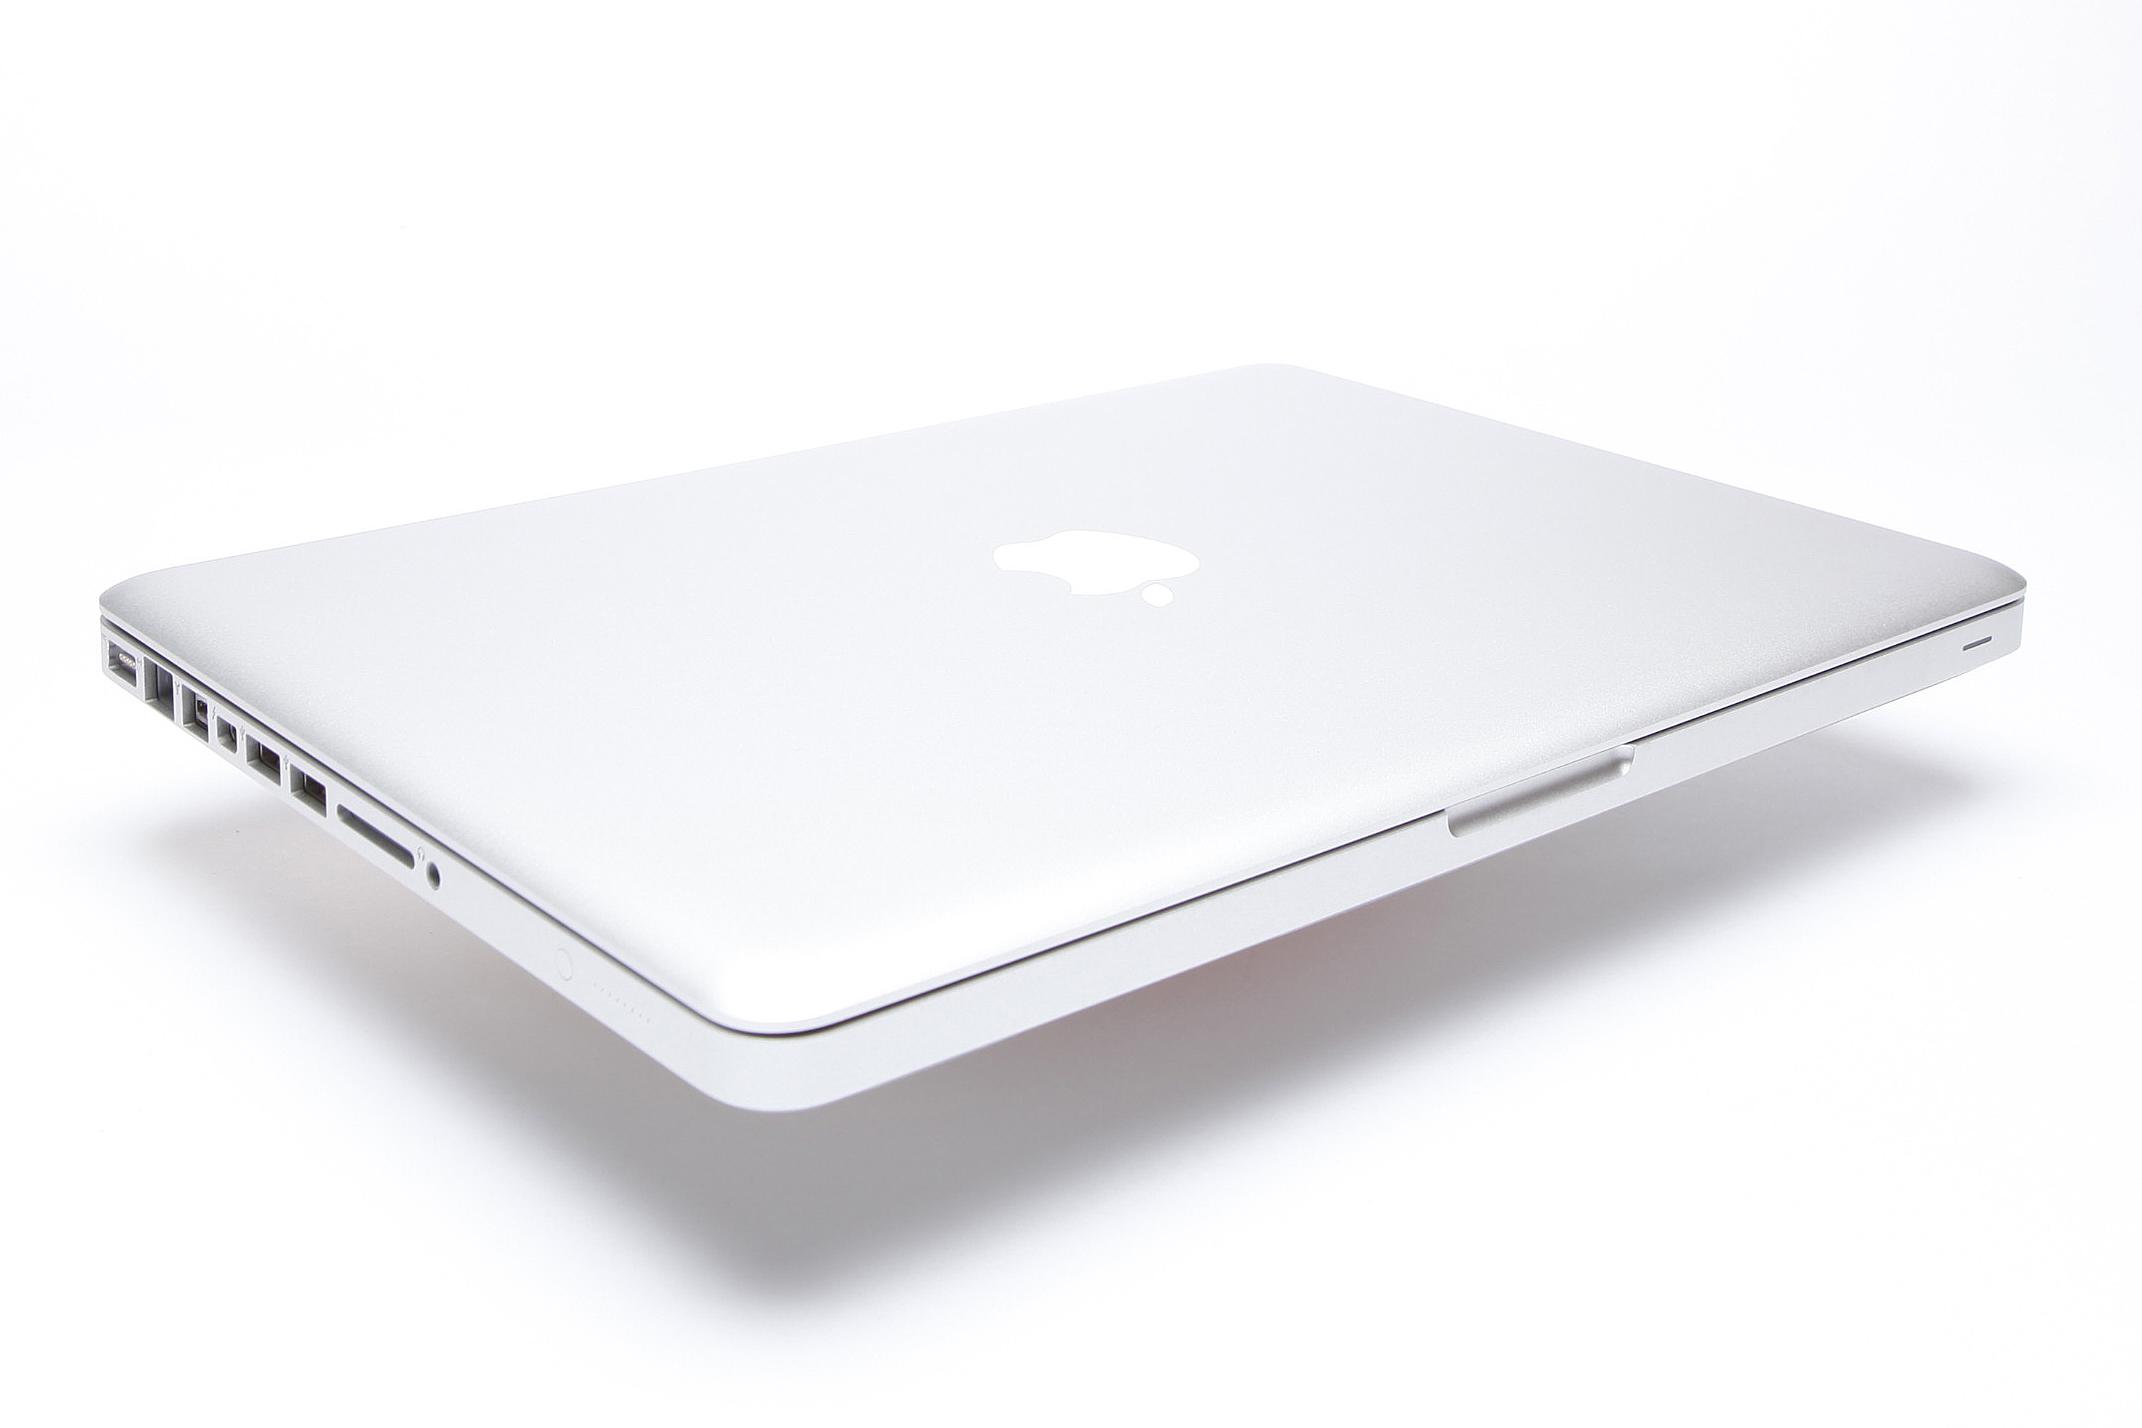 Laptop-0008.jpg